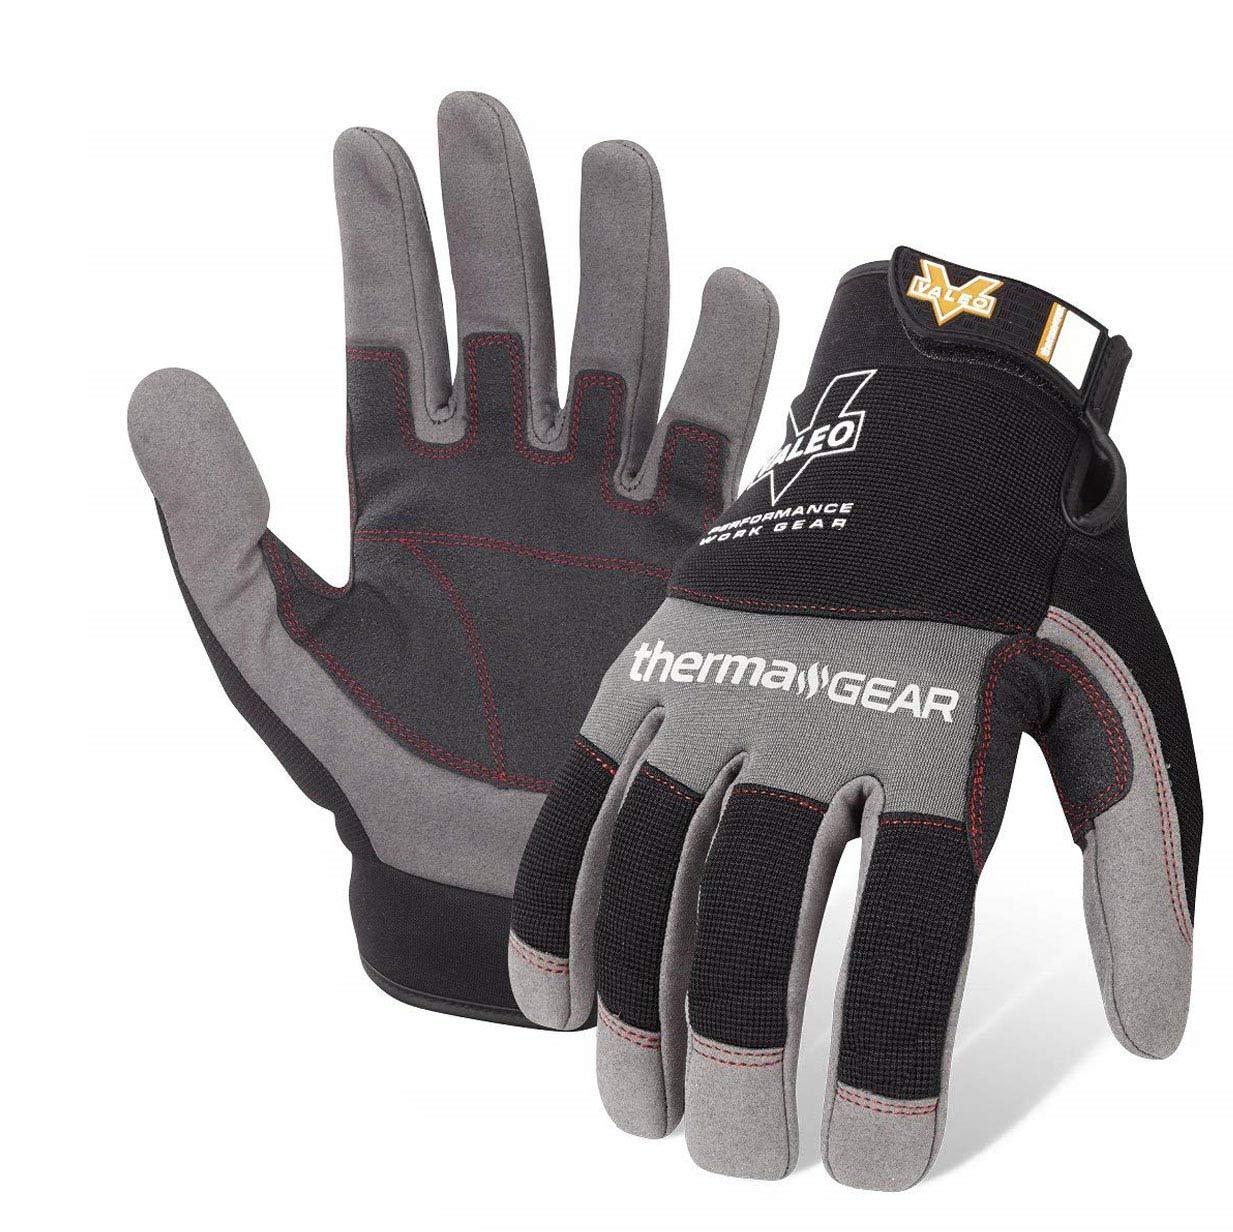 Valeo Industrial V720 ThermaGear Cold Weather Mechanics Gloves, VI9544, Pair, Grey, Medium